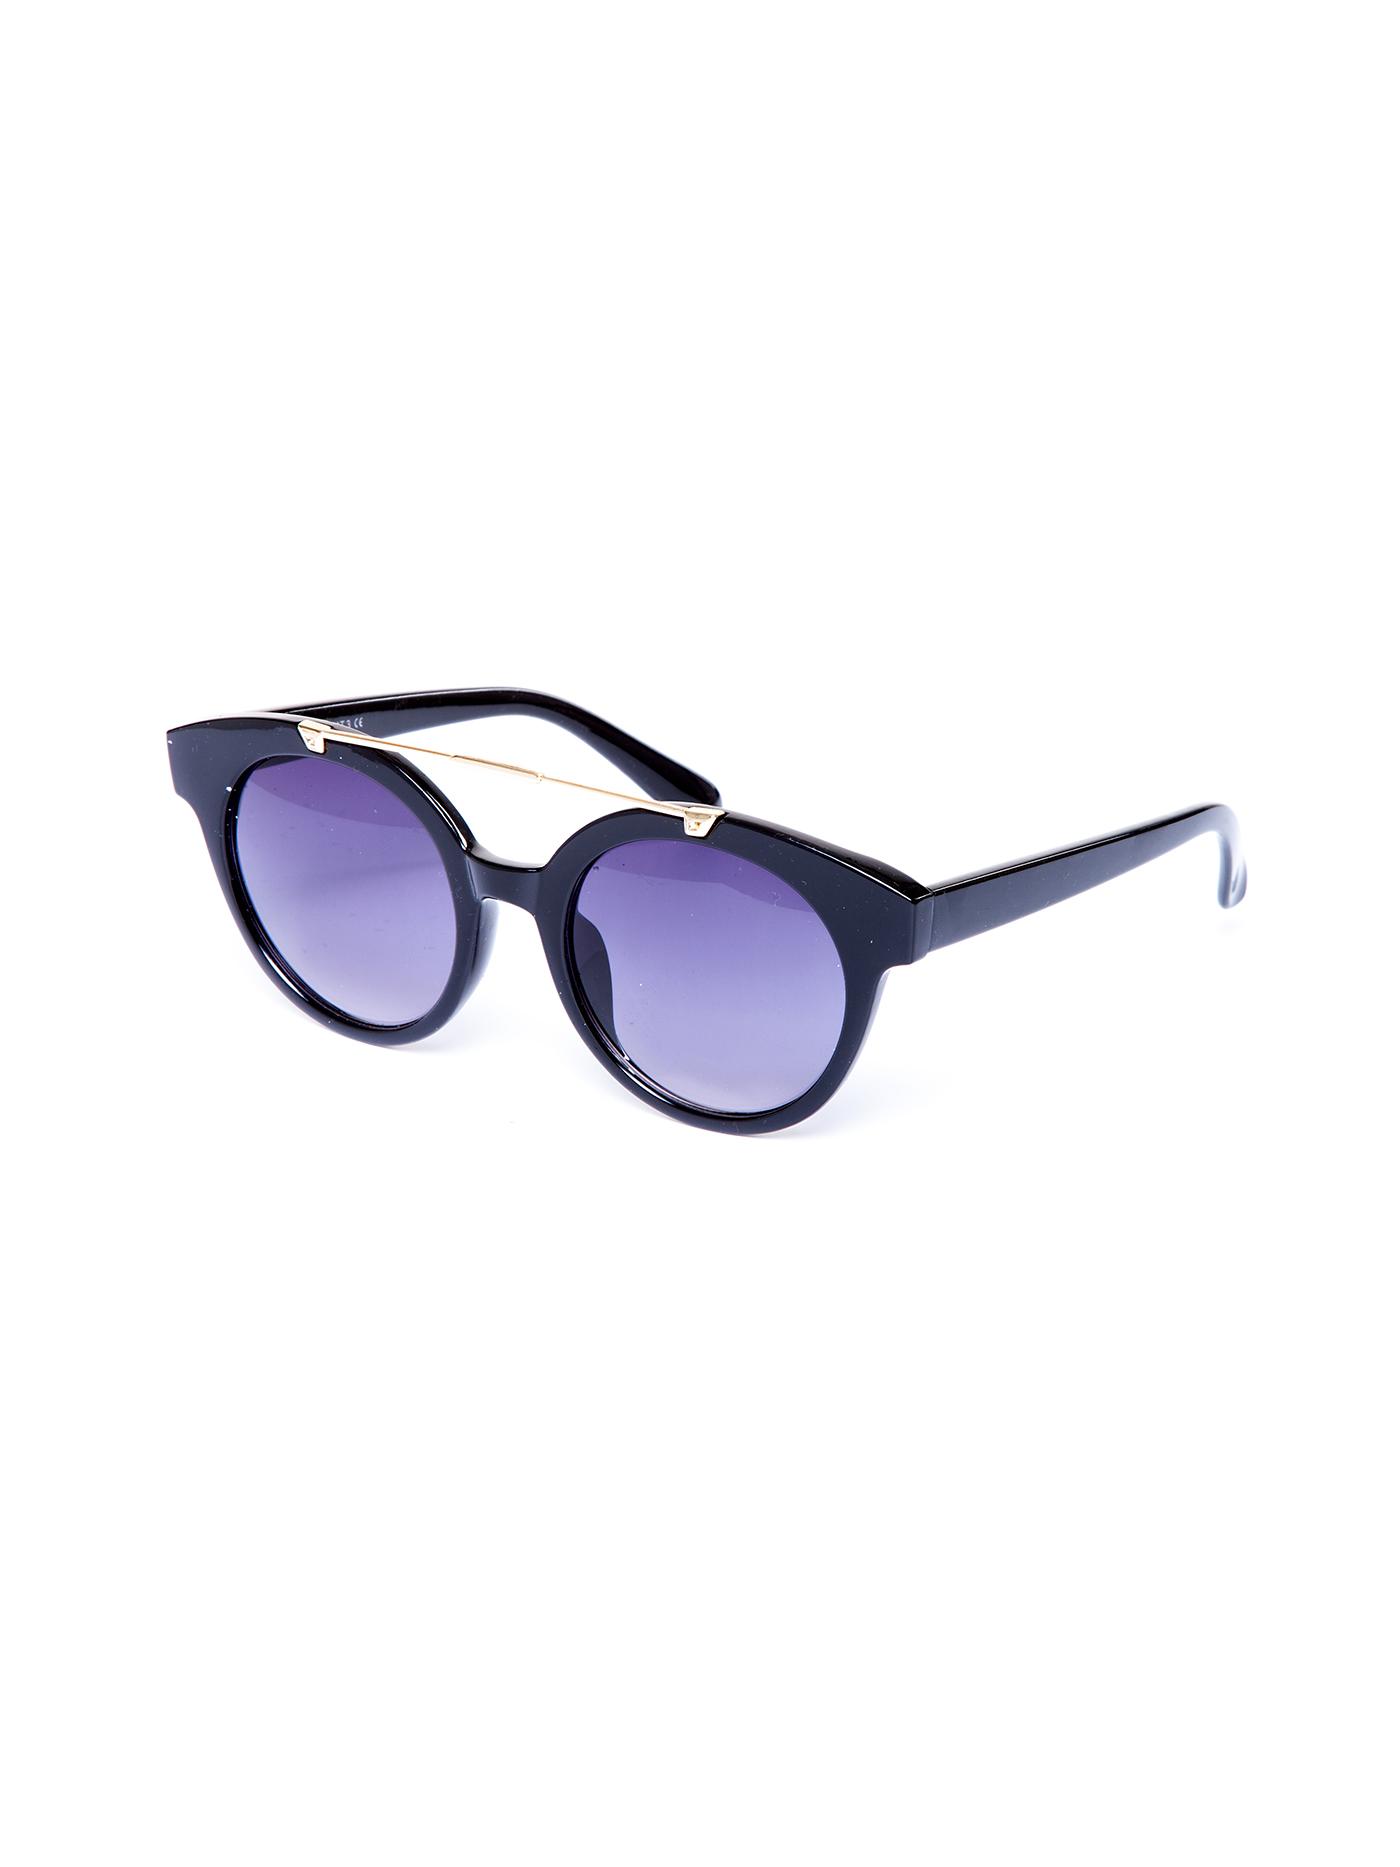 Солнцезащитные очки дефиле sunglassesДефиле<br>очки солнцезащитные<br><br>Цвет: Черный<br>Декор: Без декора<br>Стилистика: Без стилистики<br>Направление: Дефиле<br>Пол: Женский<br>Материал: 95% ПЛАСТИК,5%МЕТАЛЛ<br>Размер: -